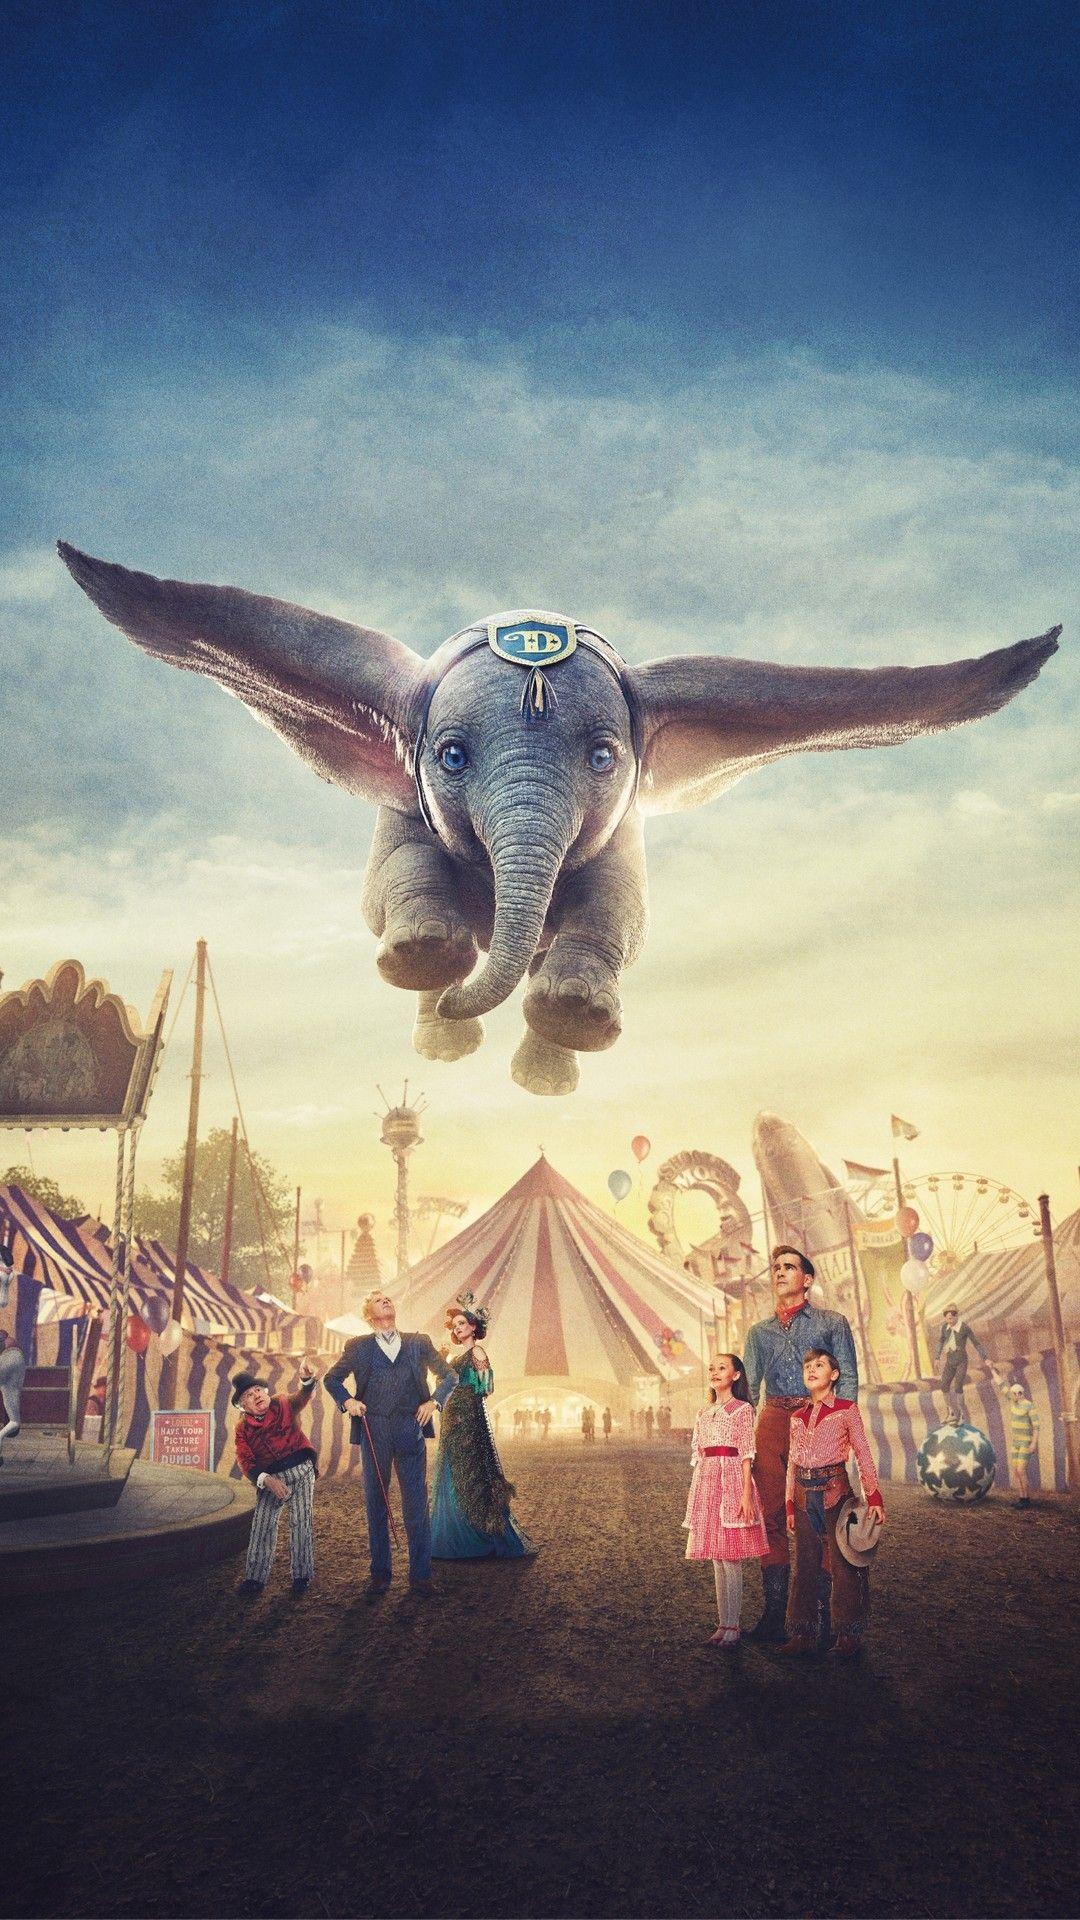 Dumbo 2019 Poster Hd Best Movie Poster Wallpaper Hd Disney Dumbo Dumbo Movie Disney Wallpaper